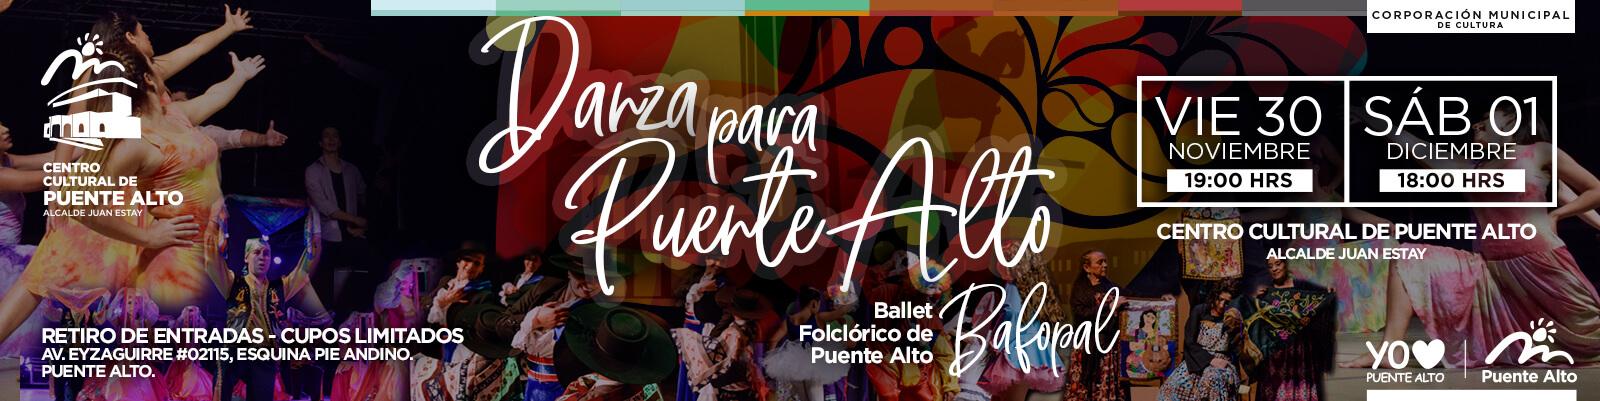 BAFOPAL Danza a Puente Alto.